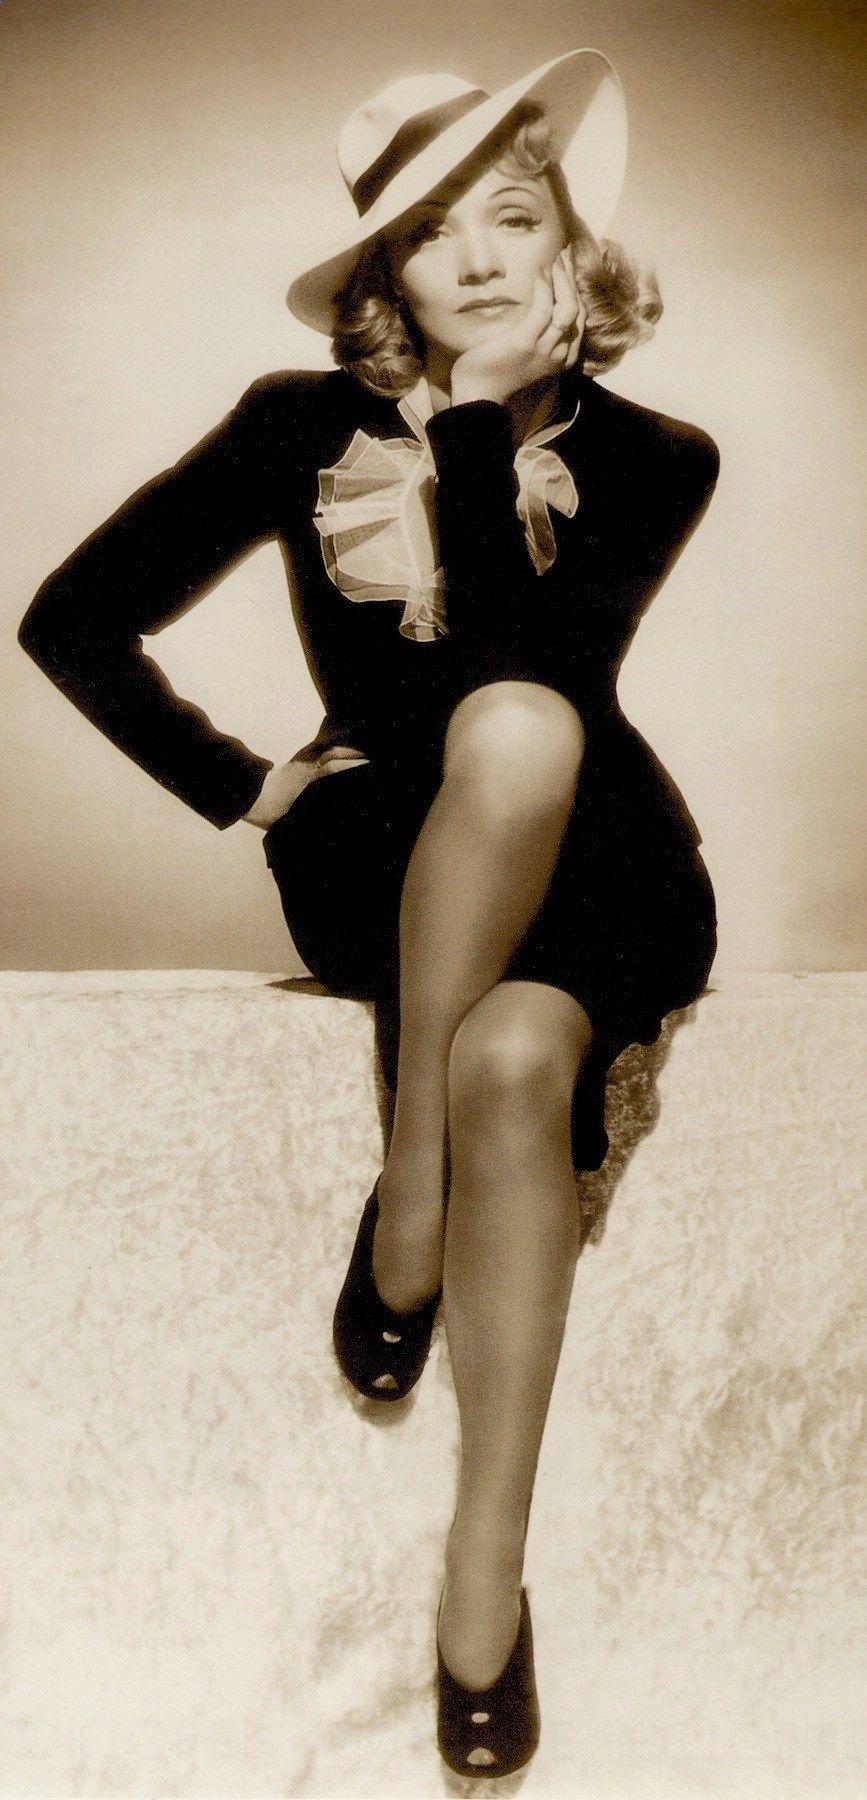 MARLENE DIETRICH in MANPOWER 1941 photo by Scotty Welbourne. I have a 20 b/w…